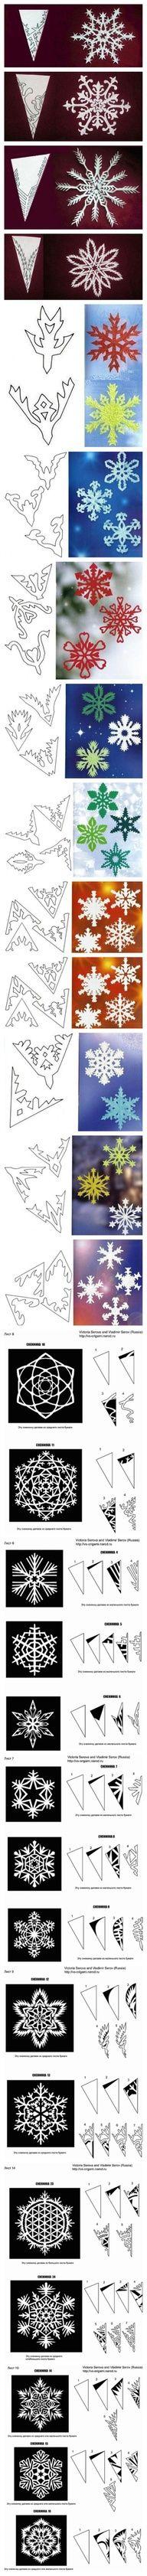 Snowflake Patterns. for a program